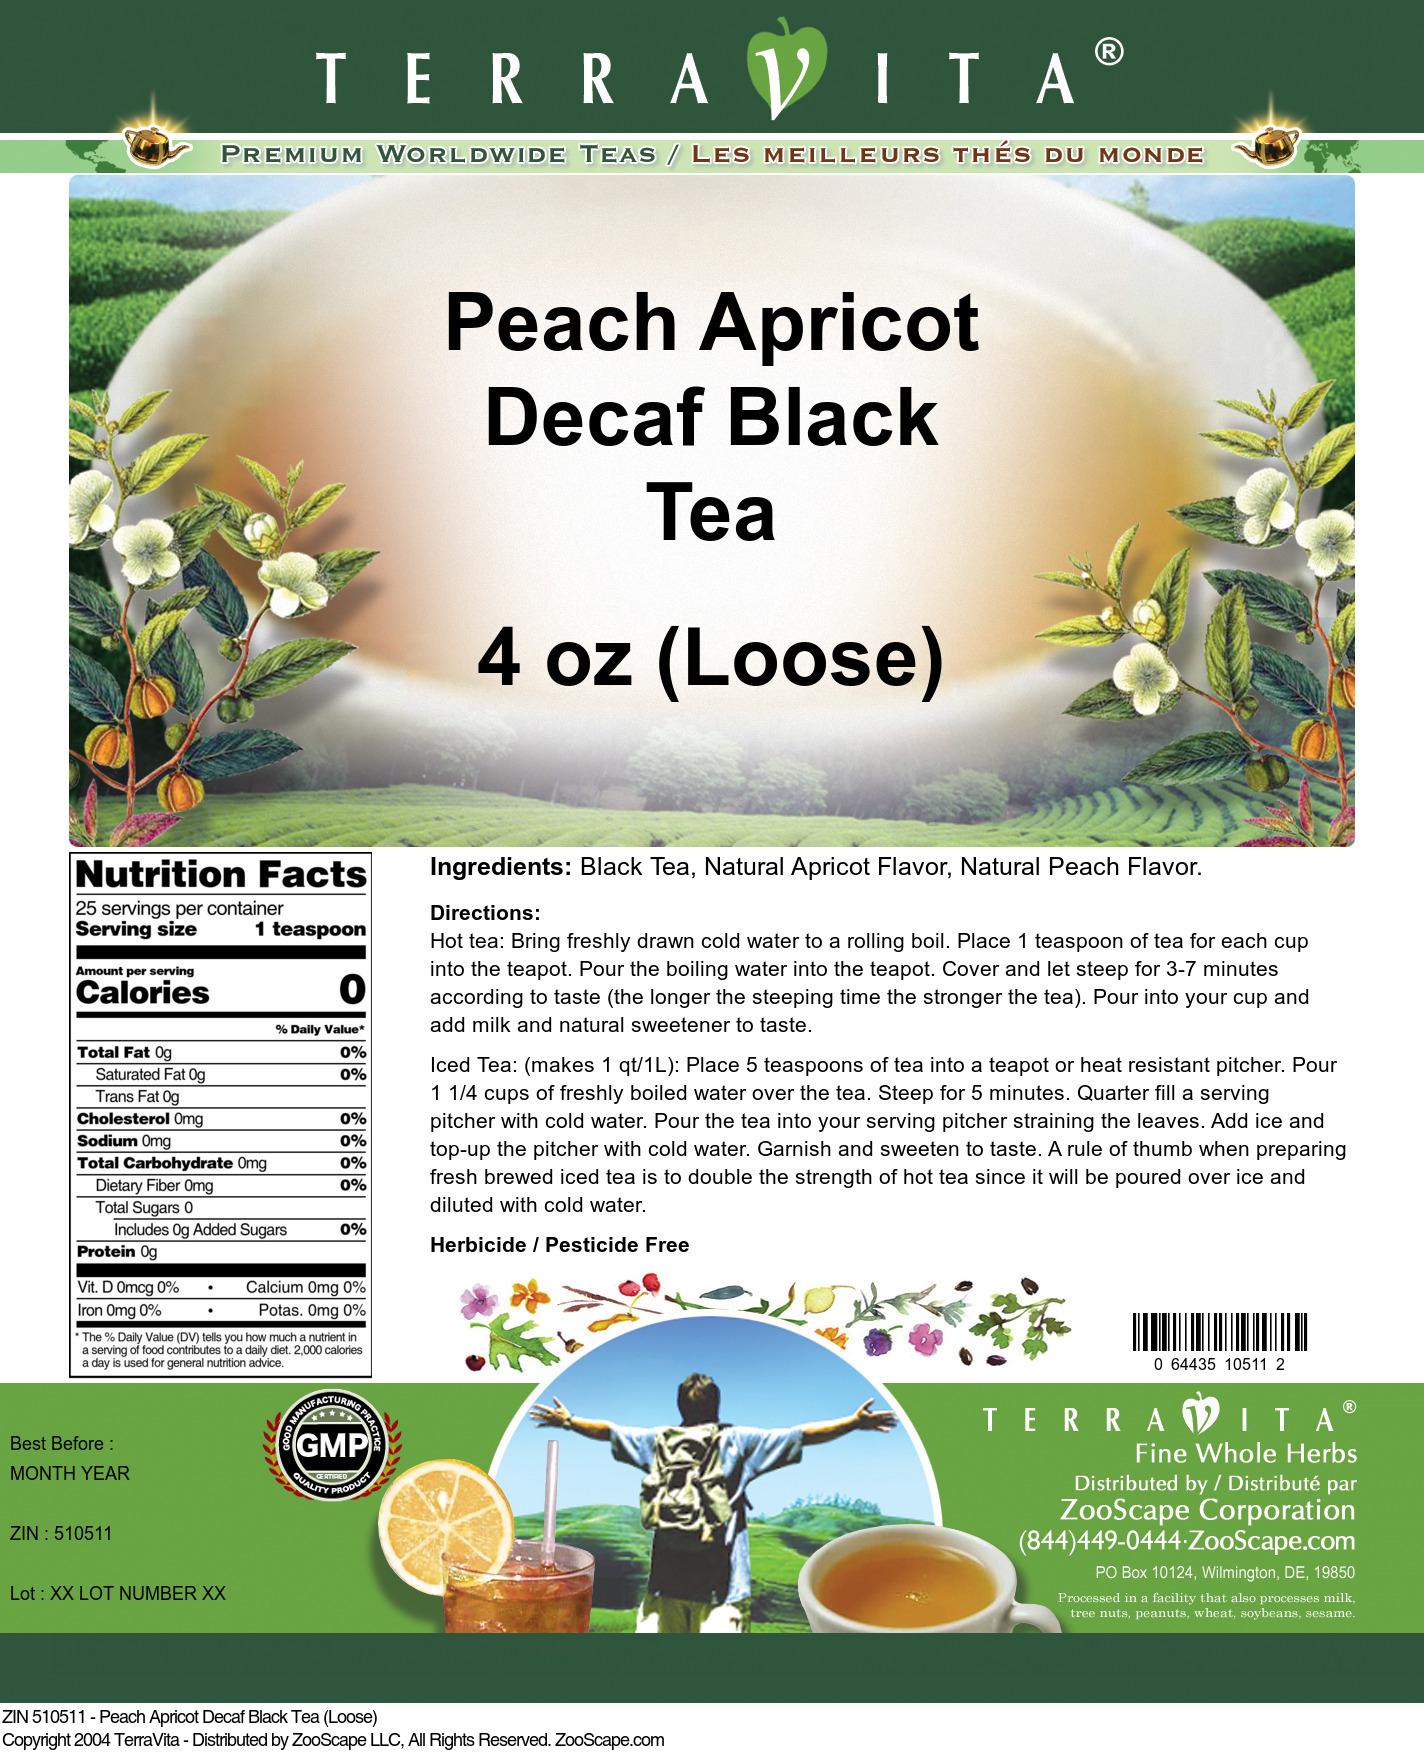 Peach Apricot Decaf Black Tea (Loose)